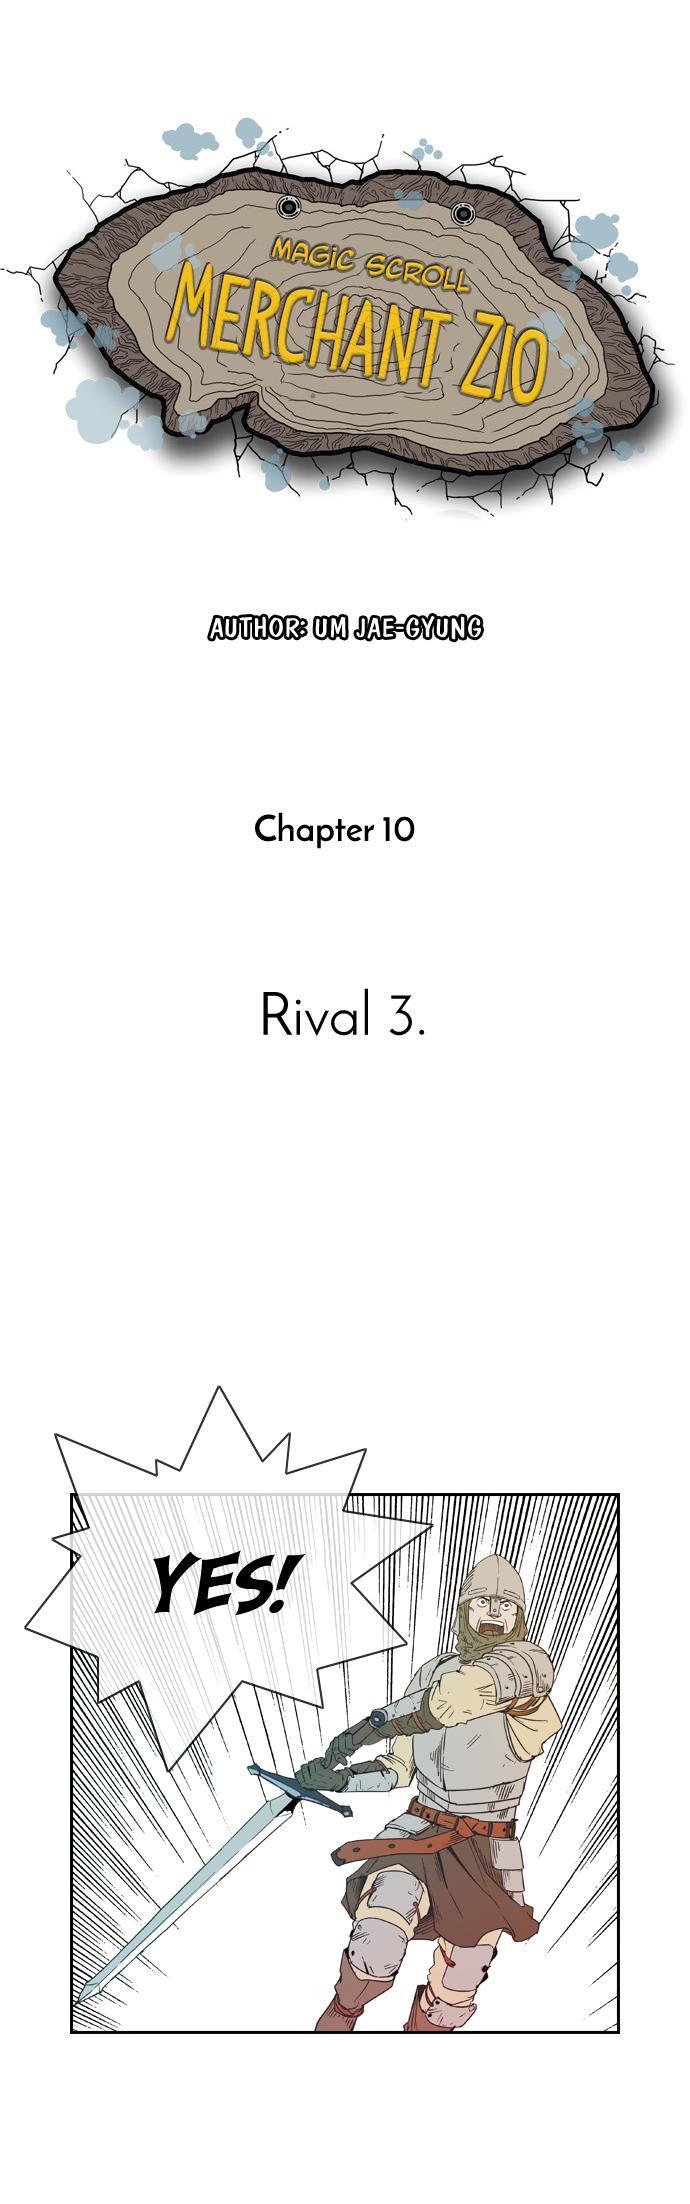 Magic scroll merchant Zio - Chapter 11